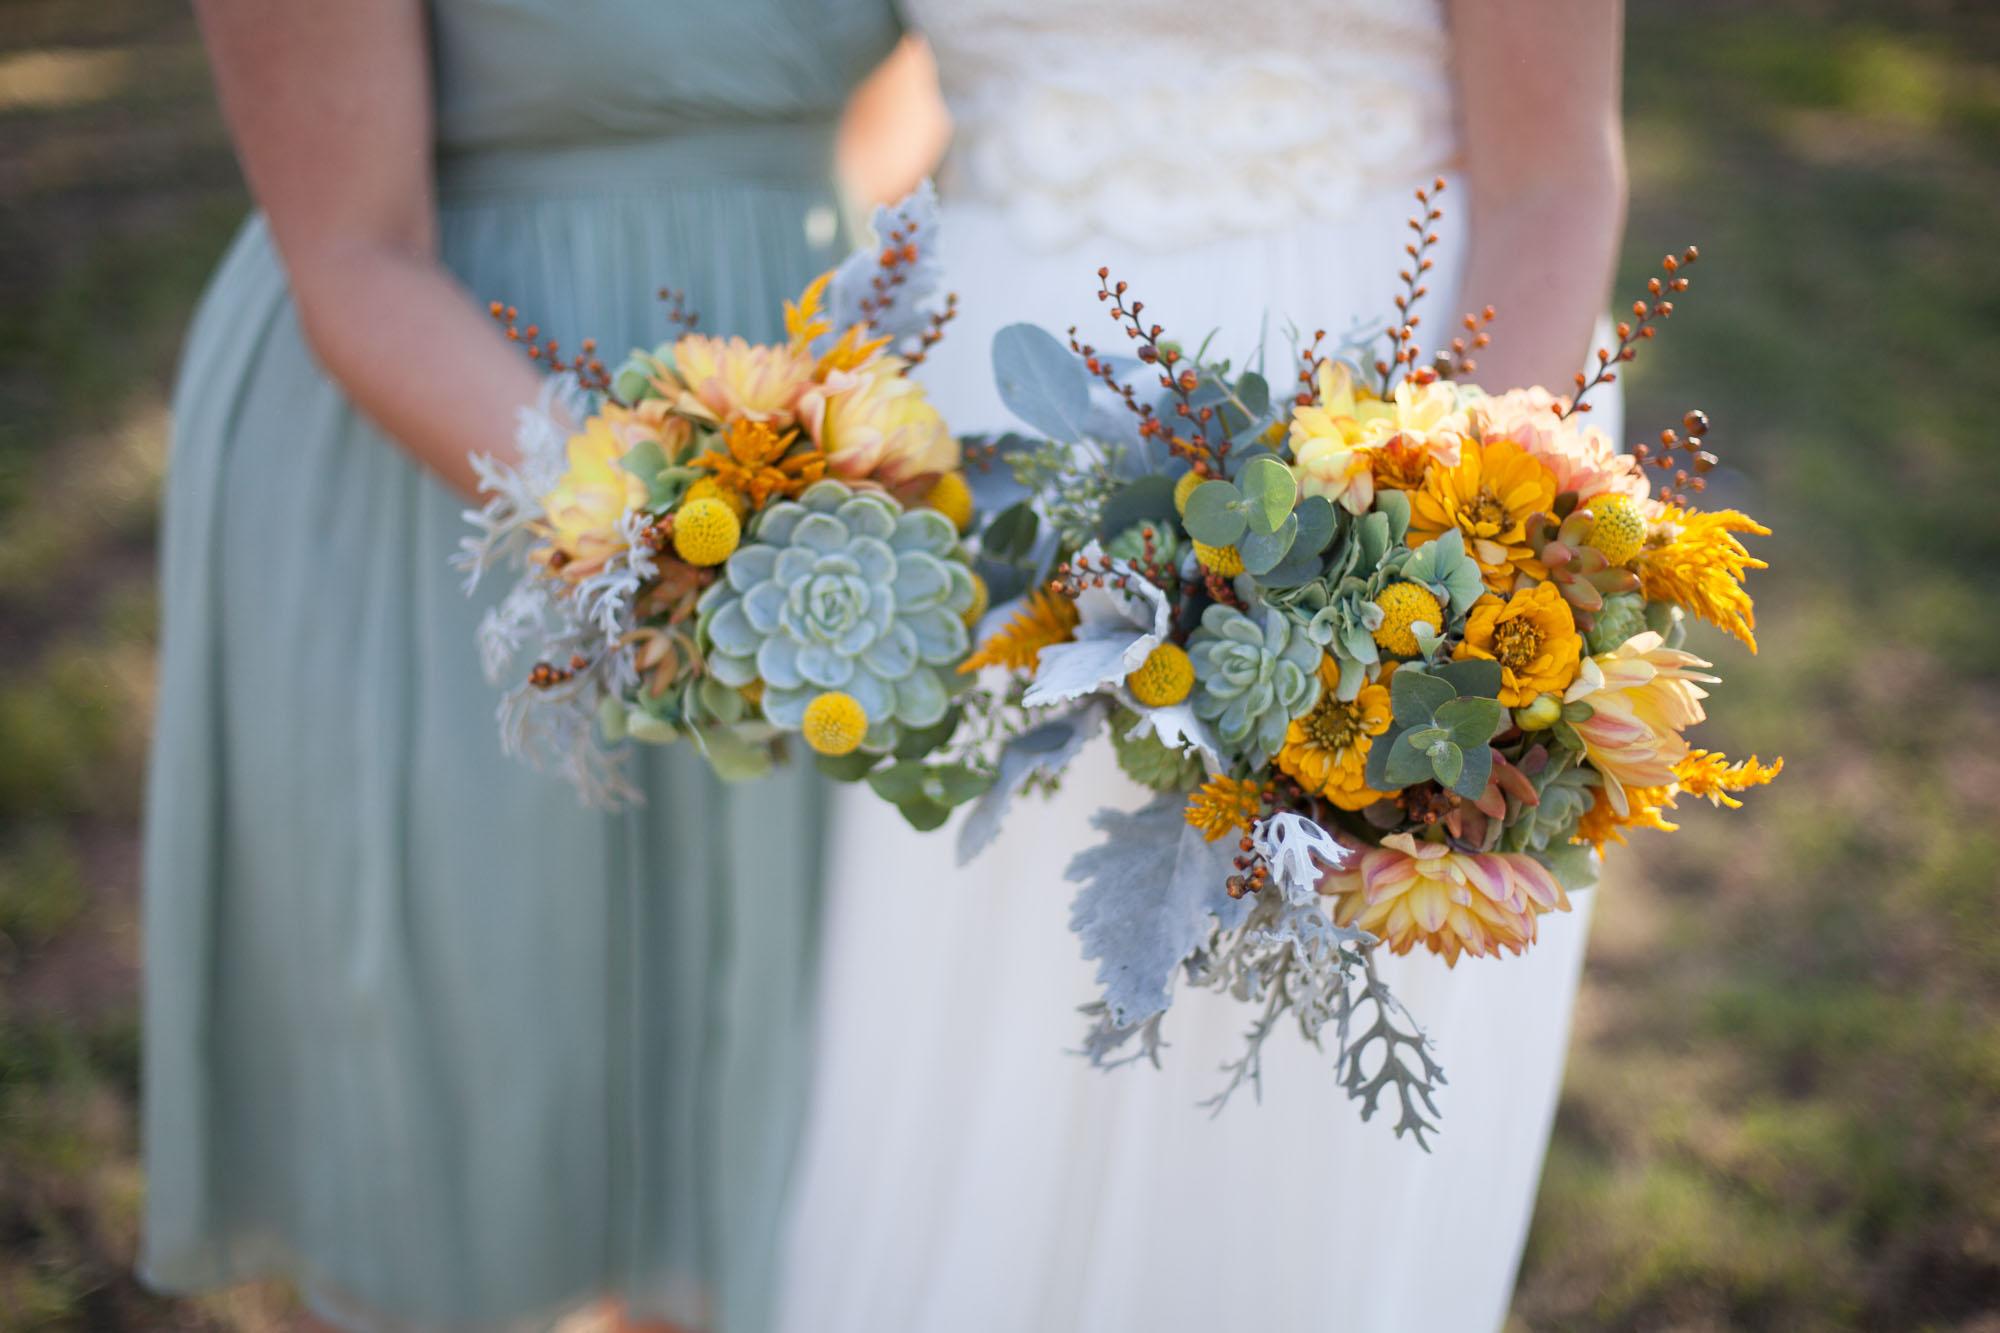 Gretchen_Gause_Petaluma_Olympias_Valley_Wedding_Photo-121.jpg